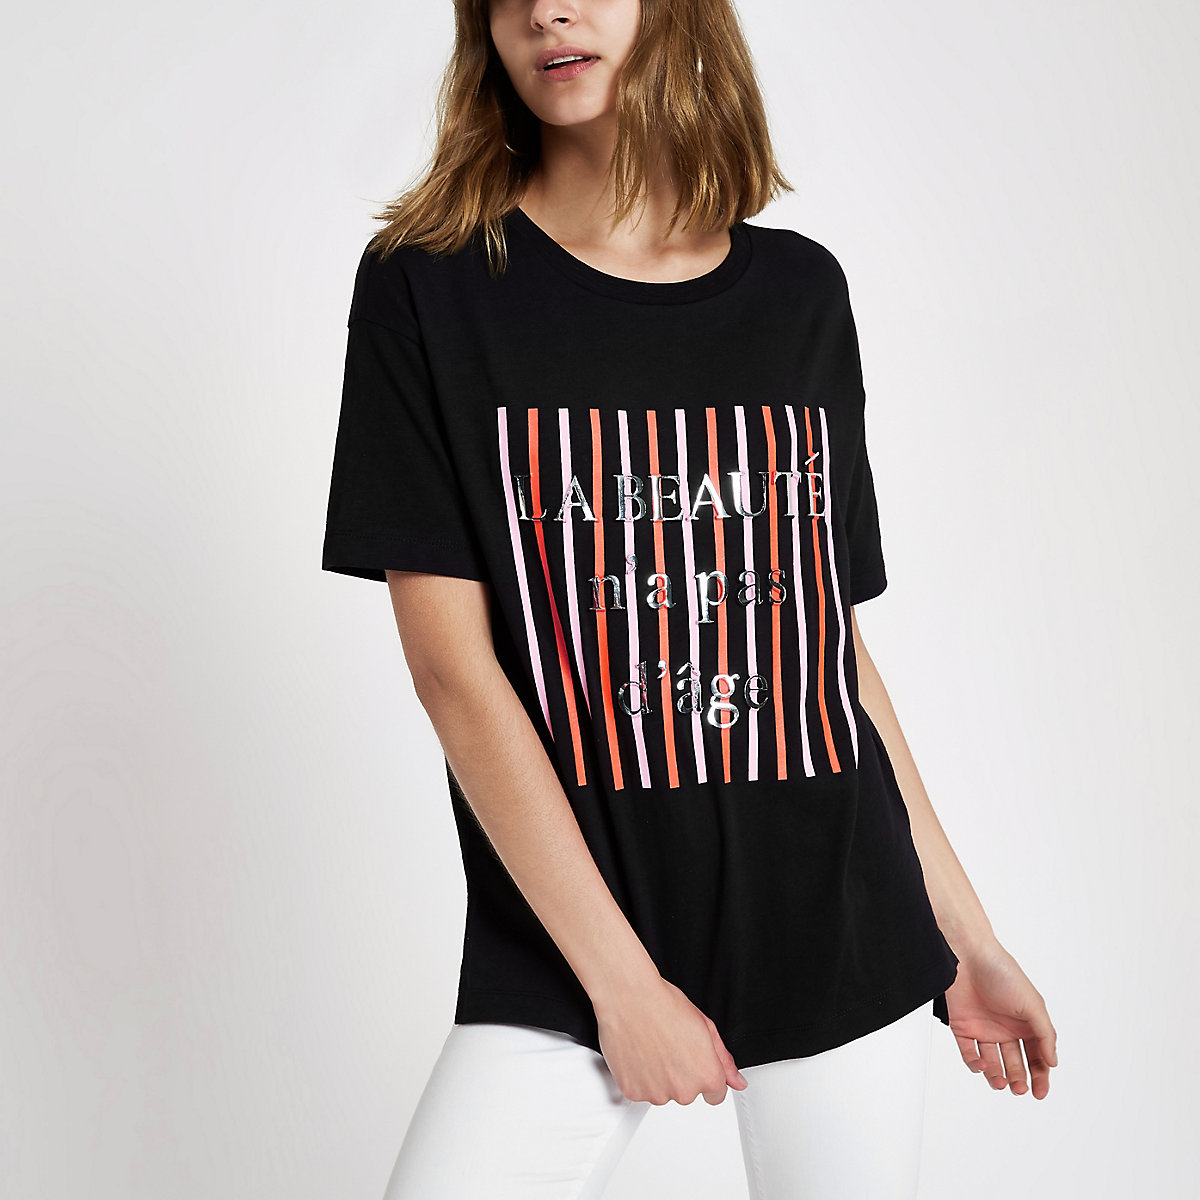 "Schwarzes, gestreiftes T-Shirt ""La beaute"""